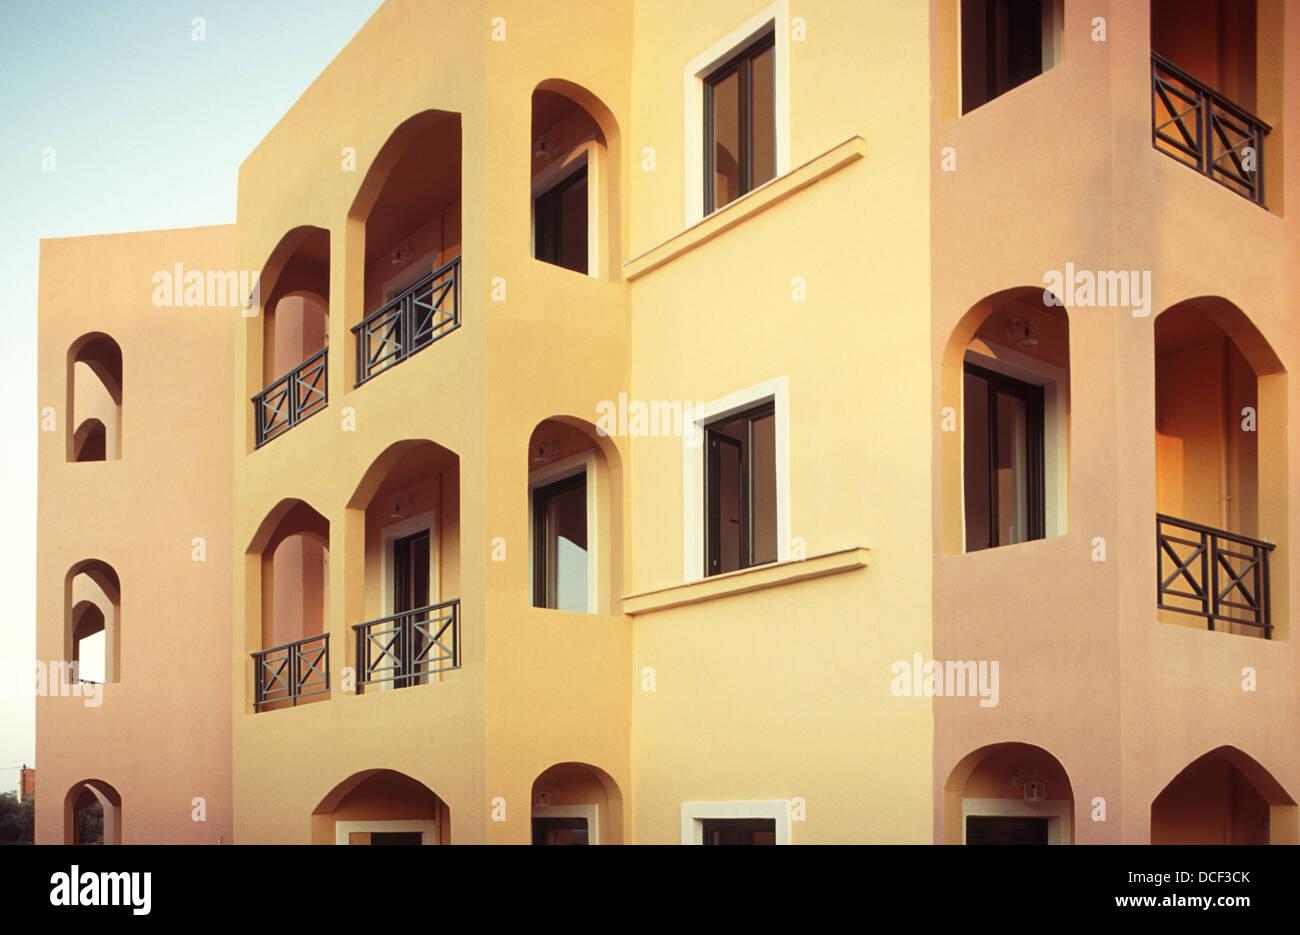 Fassade Gelb fassade in gelb und orange facade in yellow and orange colors stock